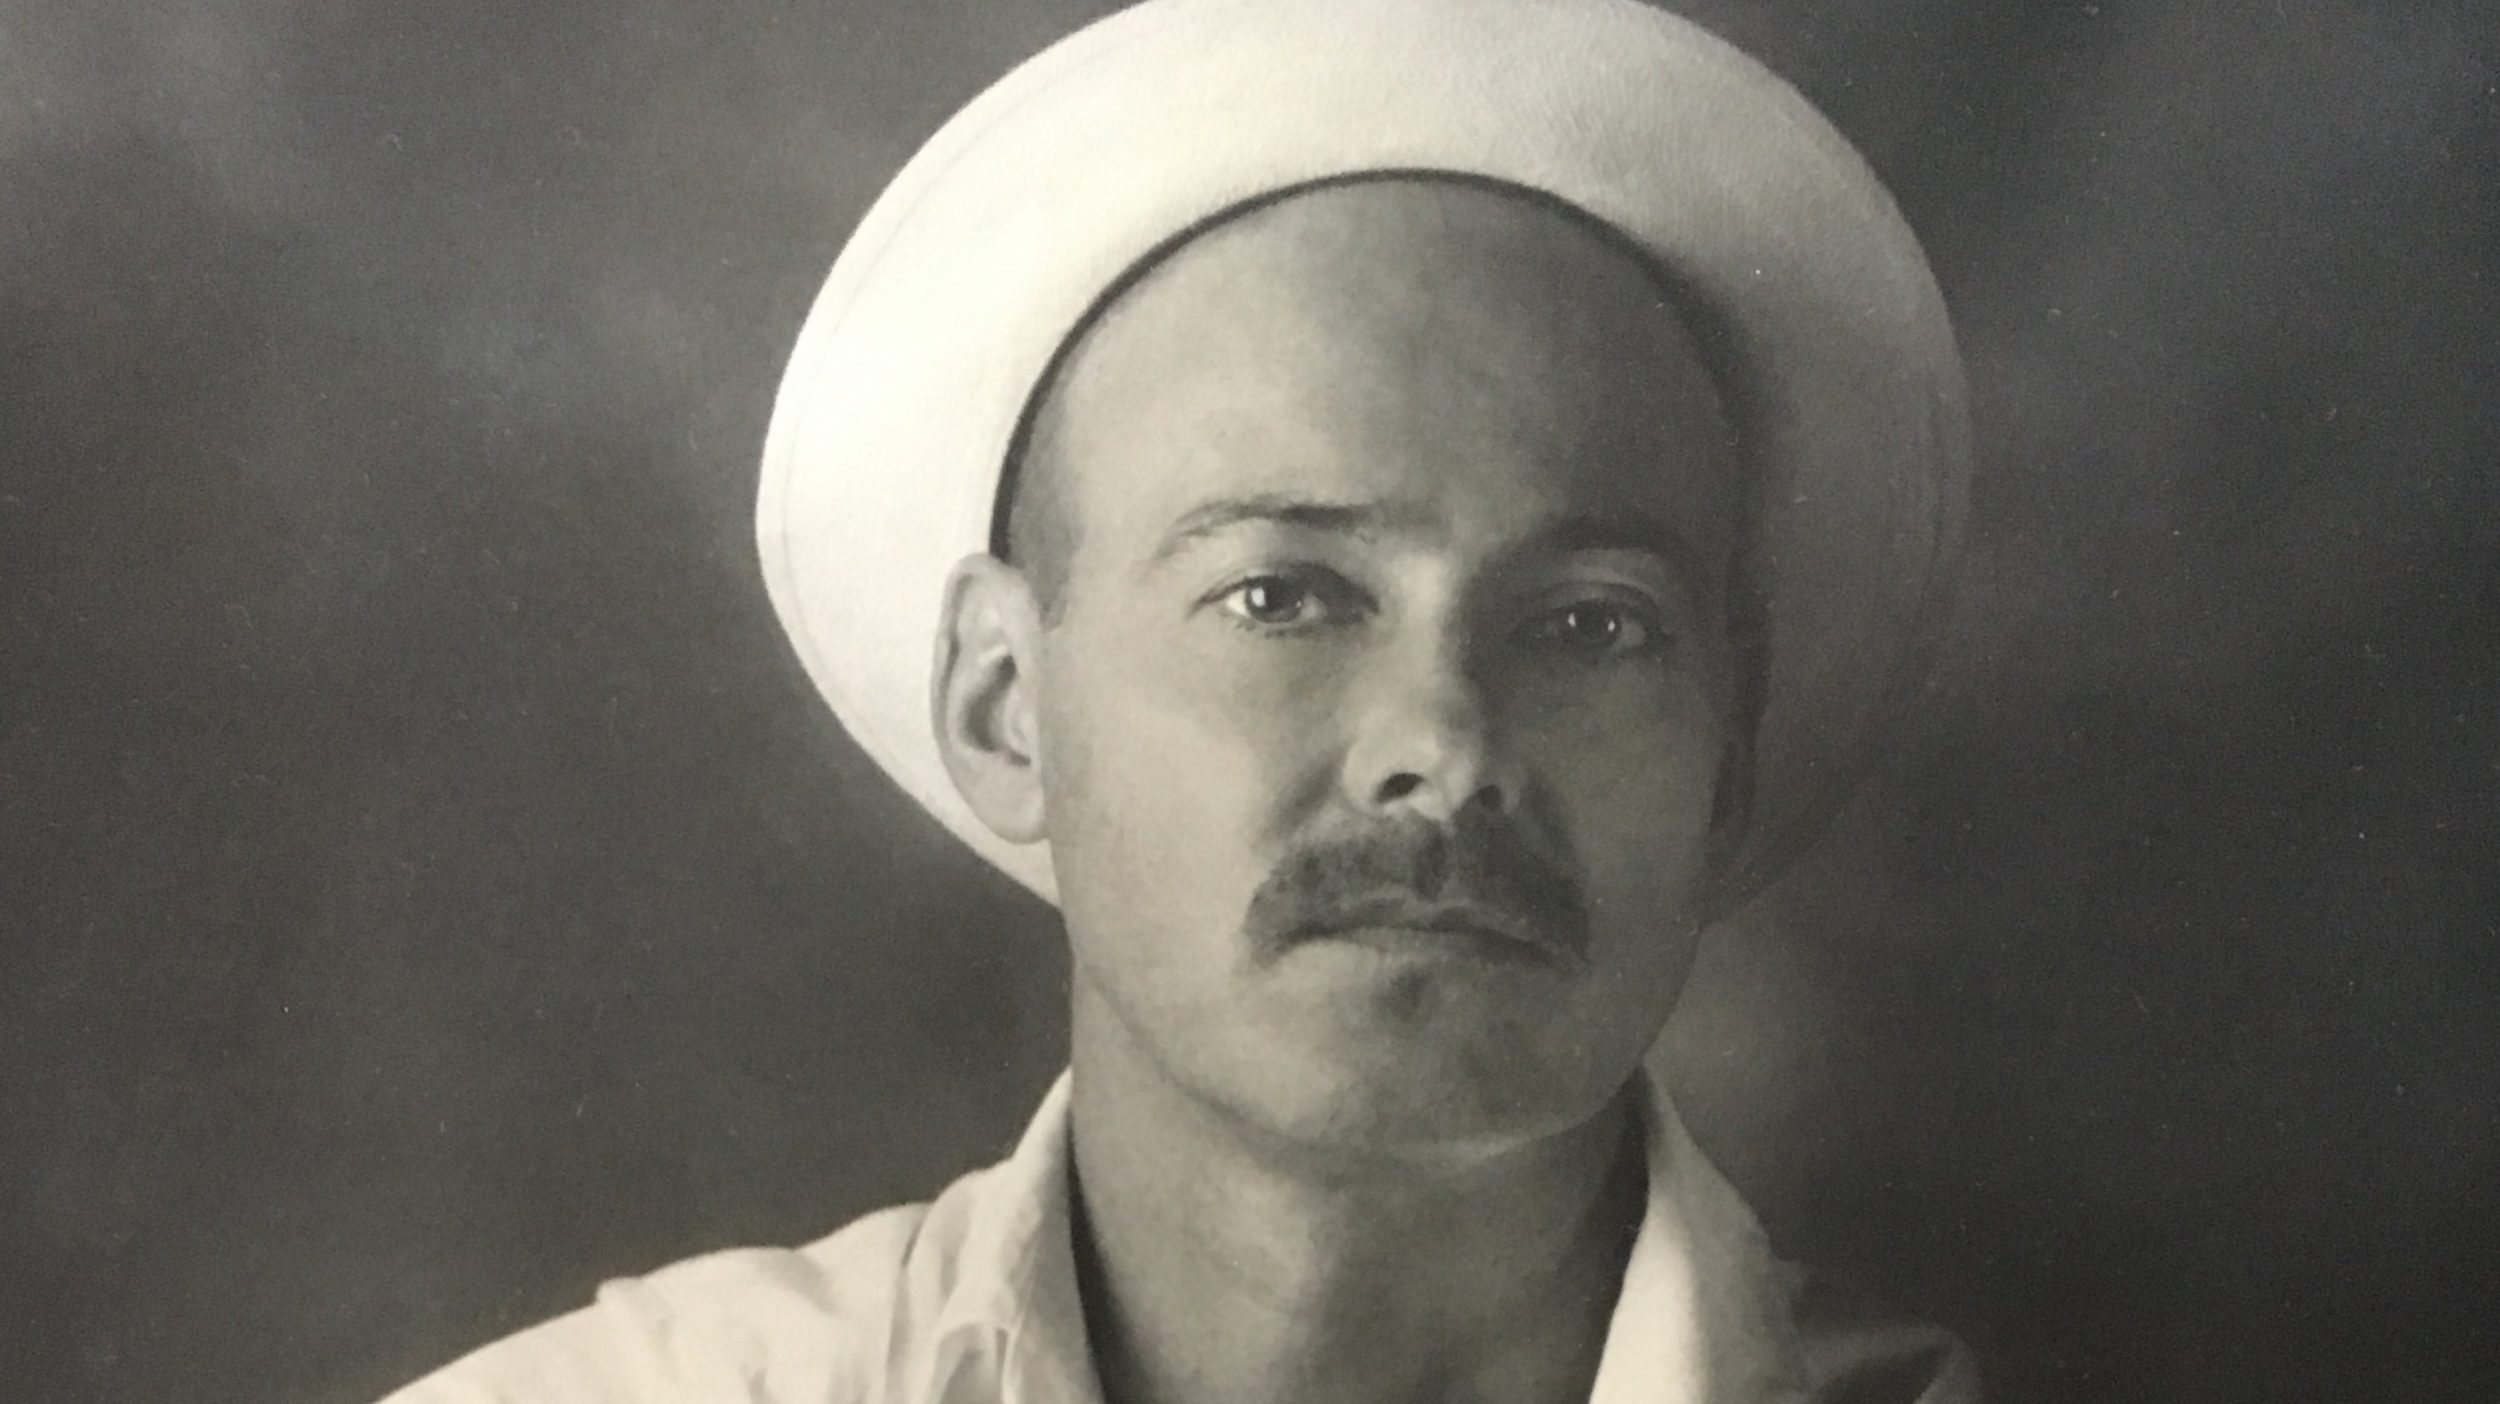 Maurice Bartikofsky